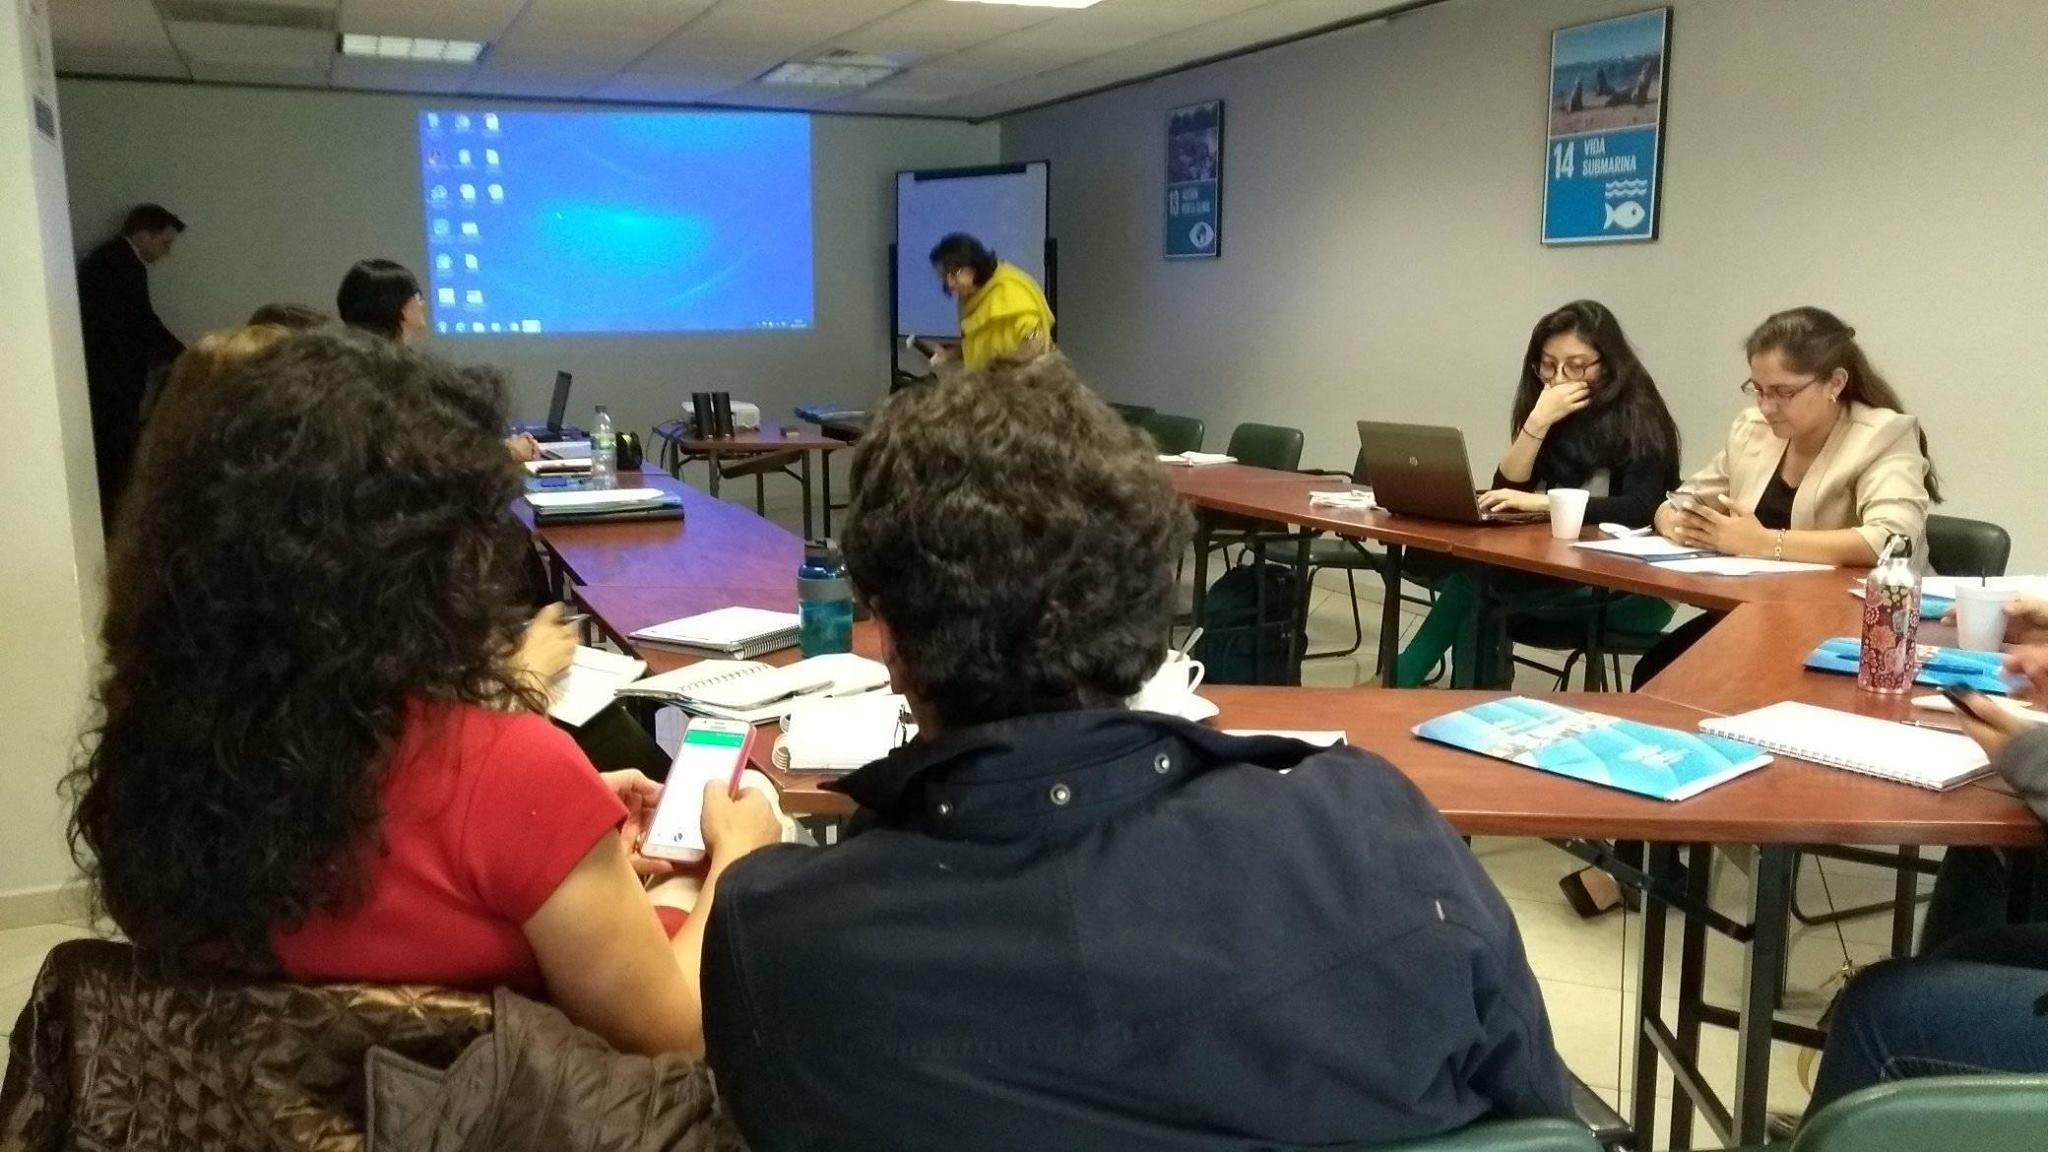 Testimony about interpreters in Ecuador